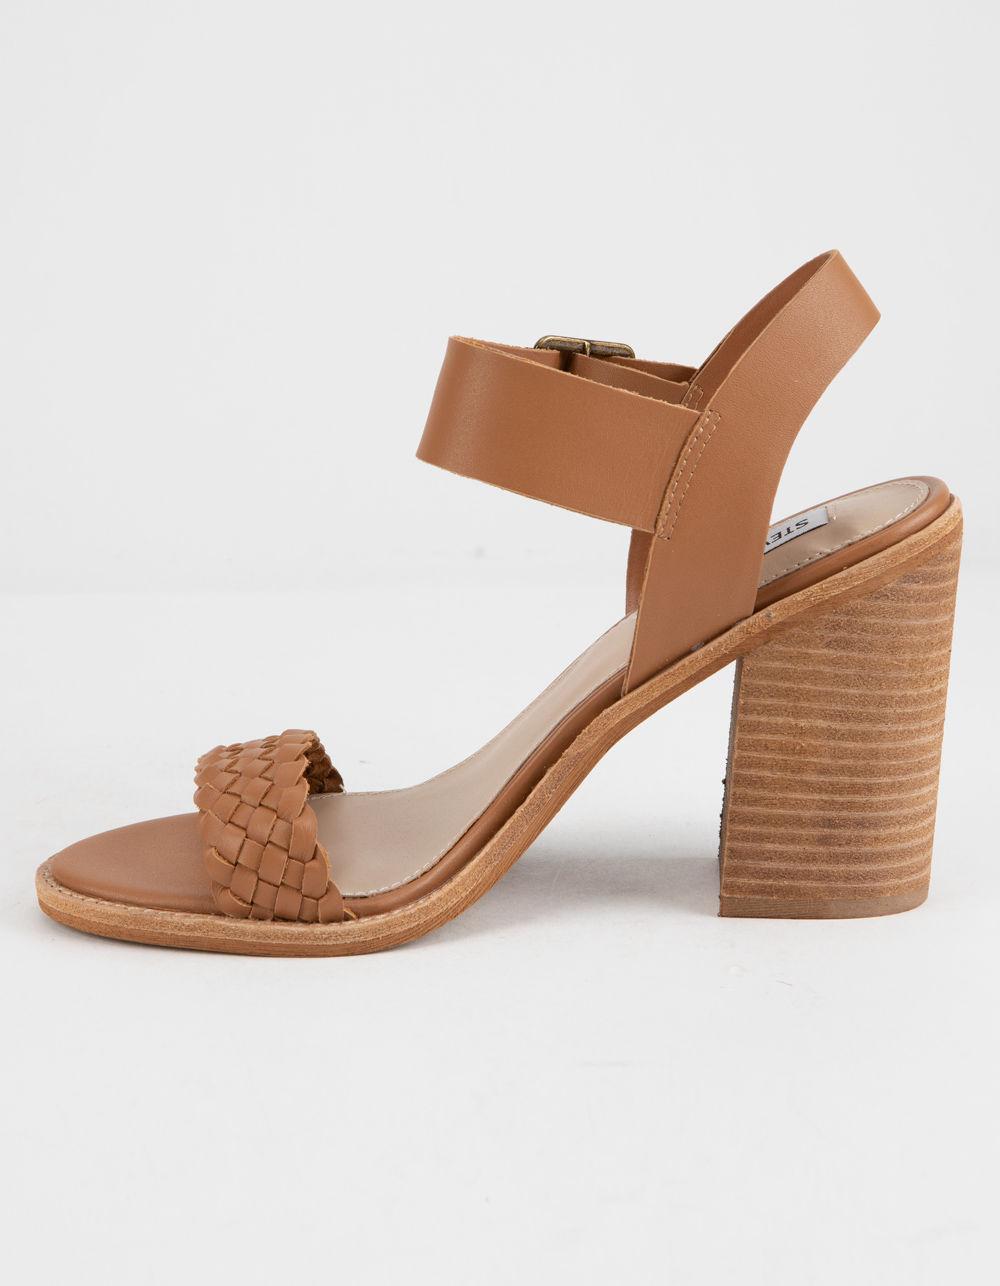 b572e0bc8cf Steve Madden - Brown Cadence Cognac Leather Womens Heeled Sandals - Lyst.  View fullscreen